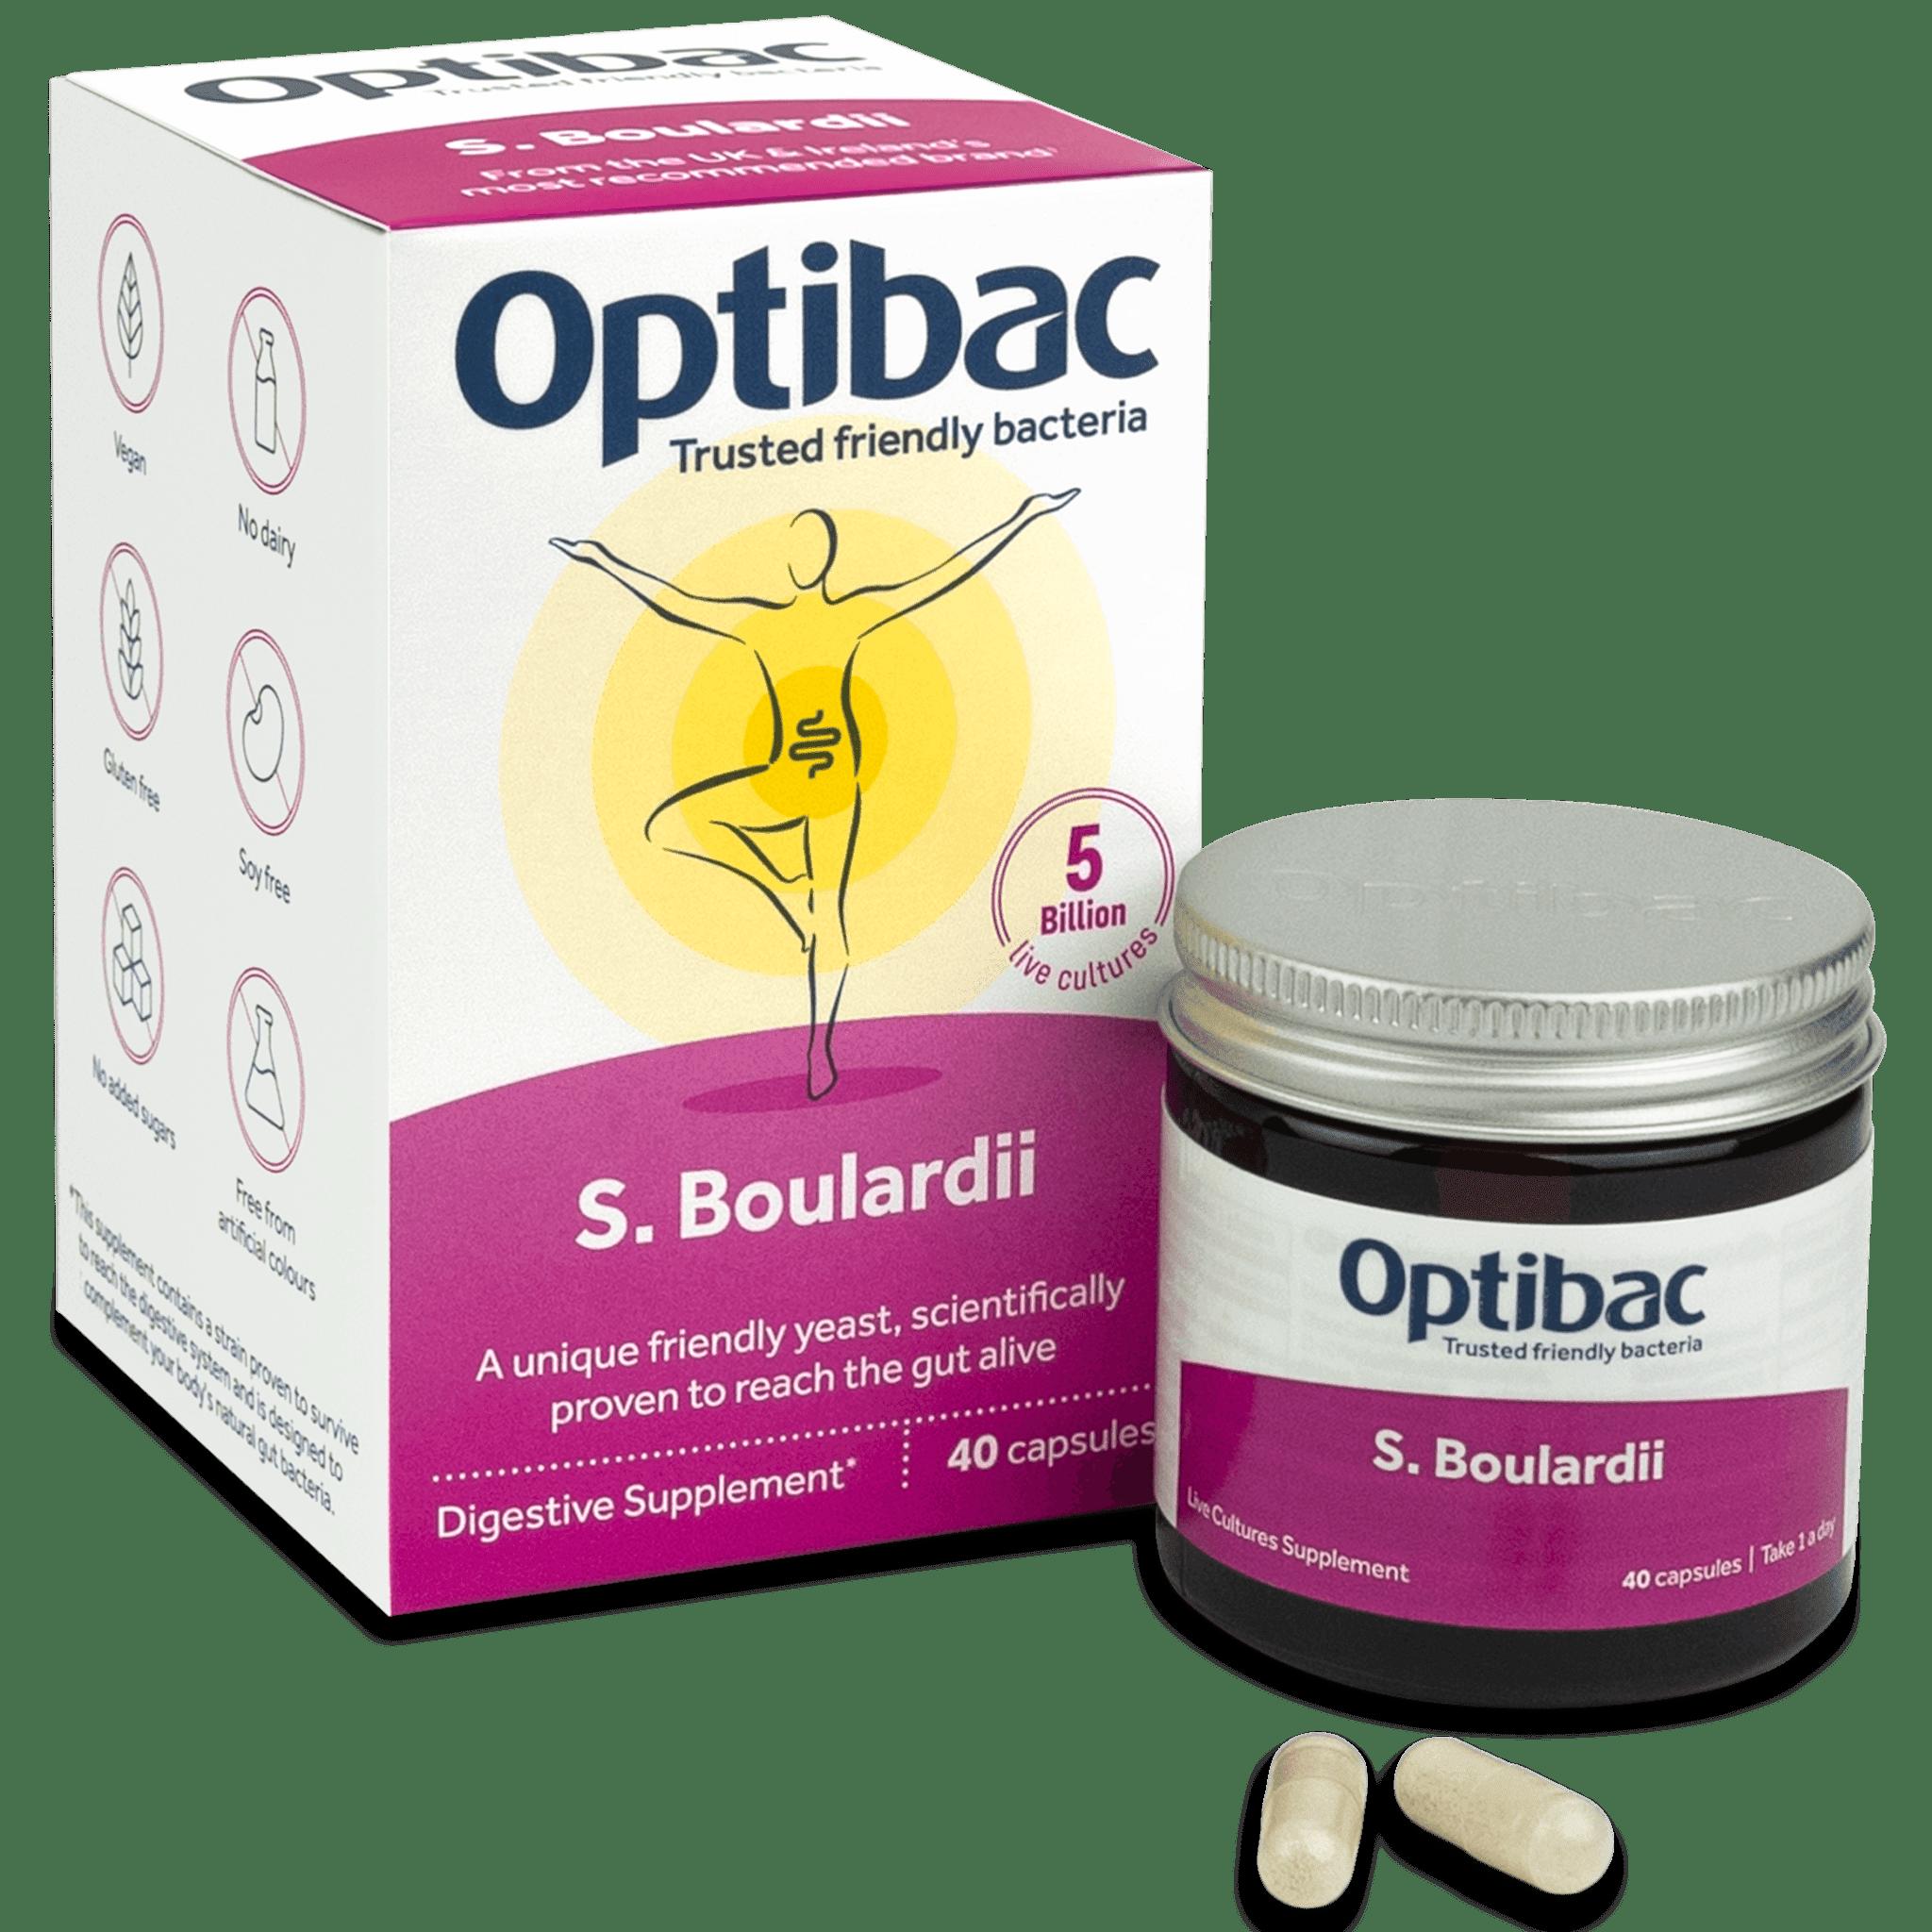 Optibac Probiotics Saccharomyces boulardii (40 capsules) pack contents